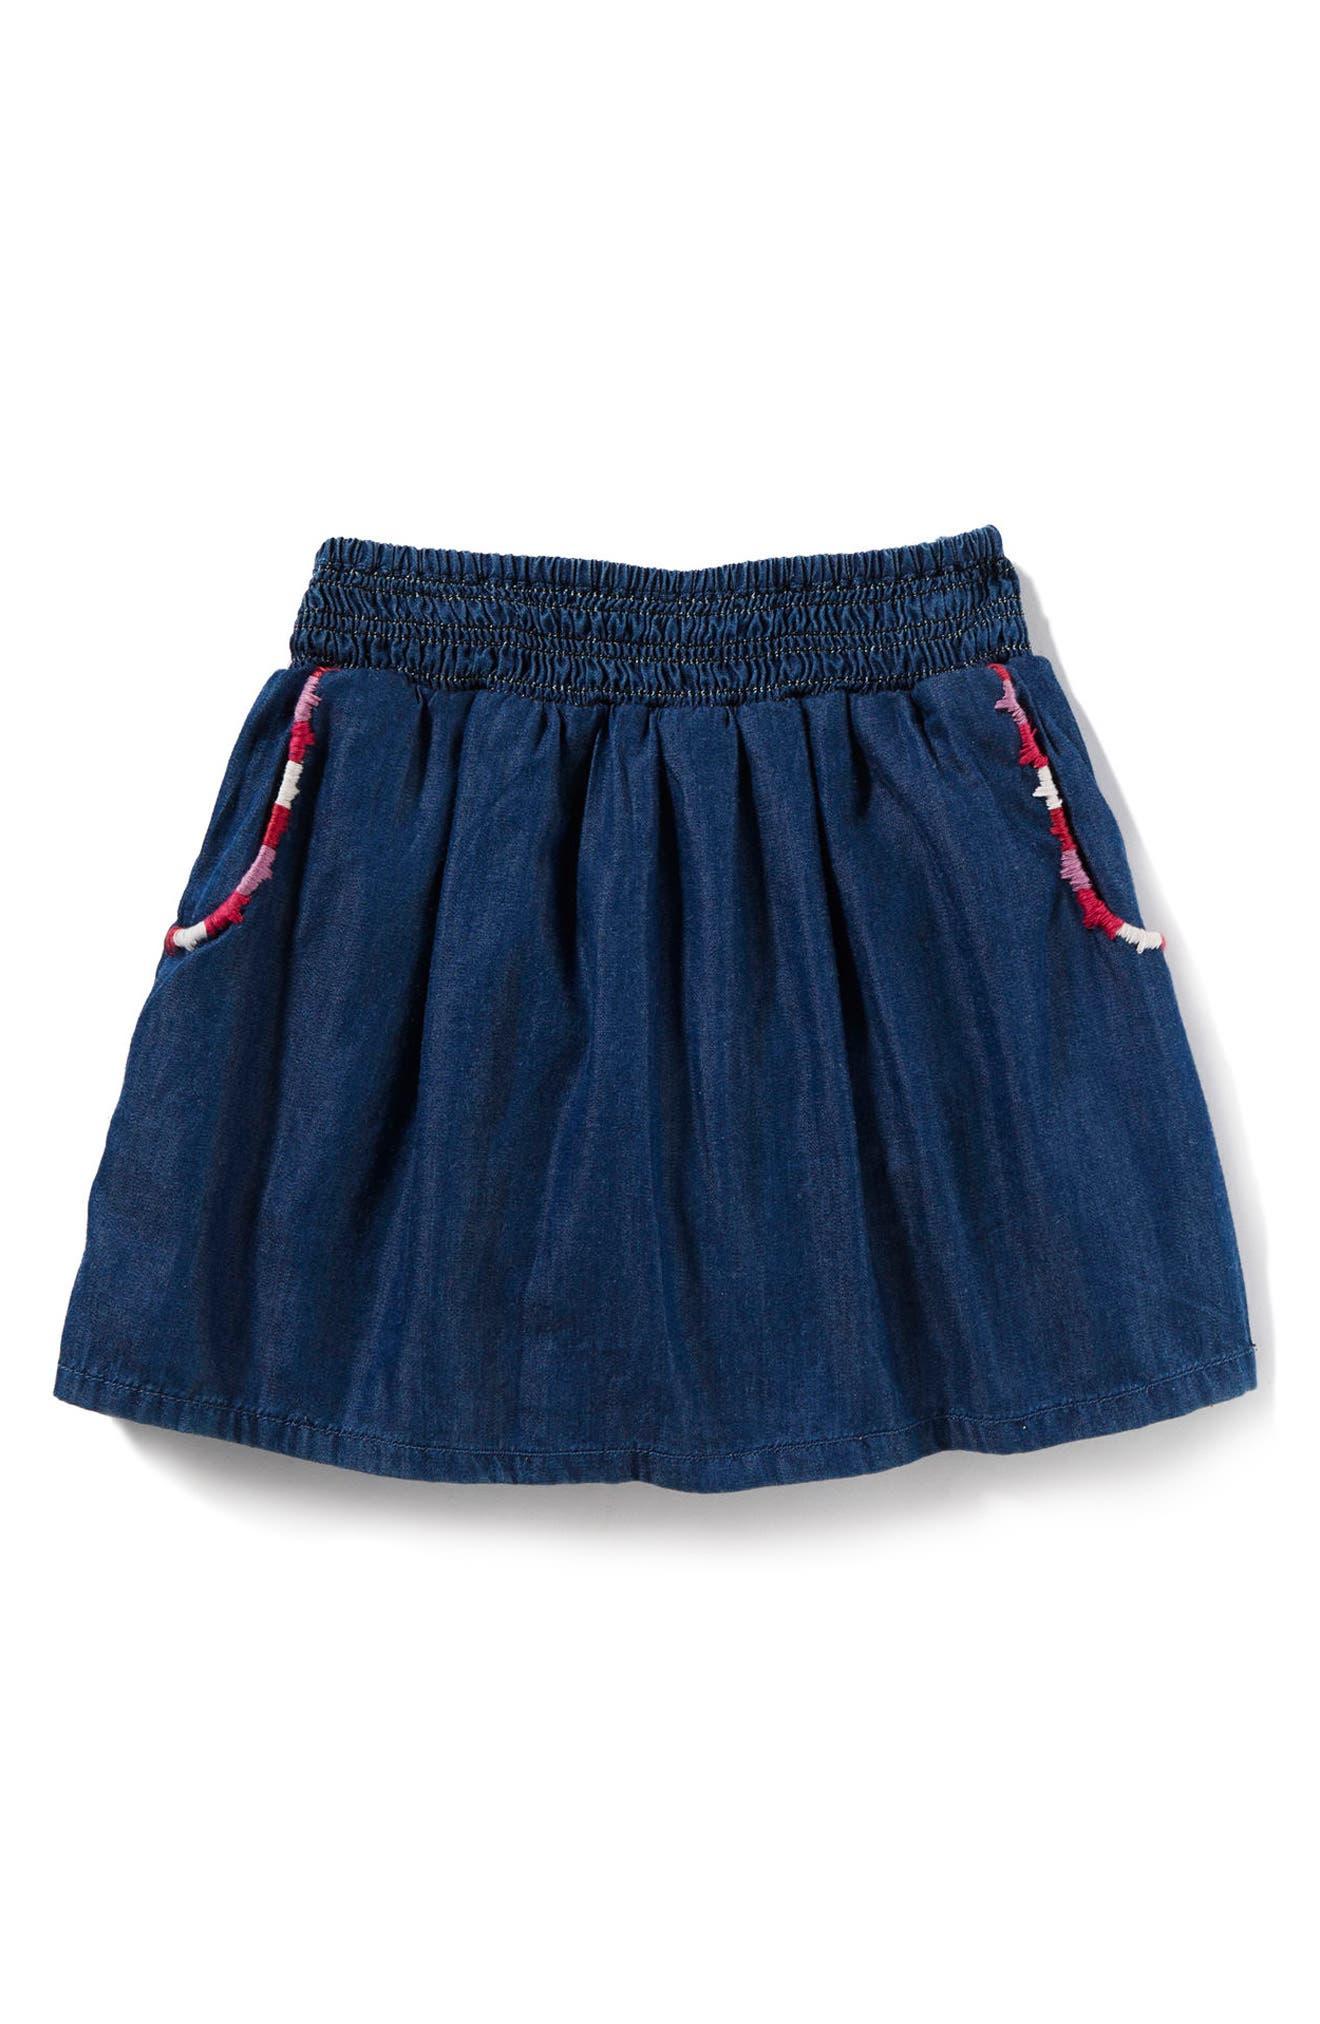 Infant Girls Peek Bellen Skort Size S (36m)  Blue